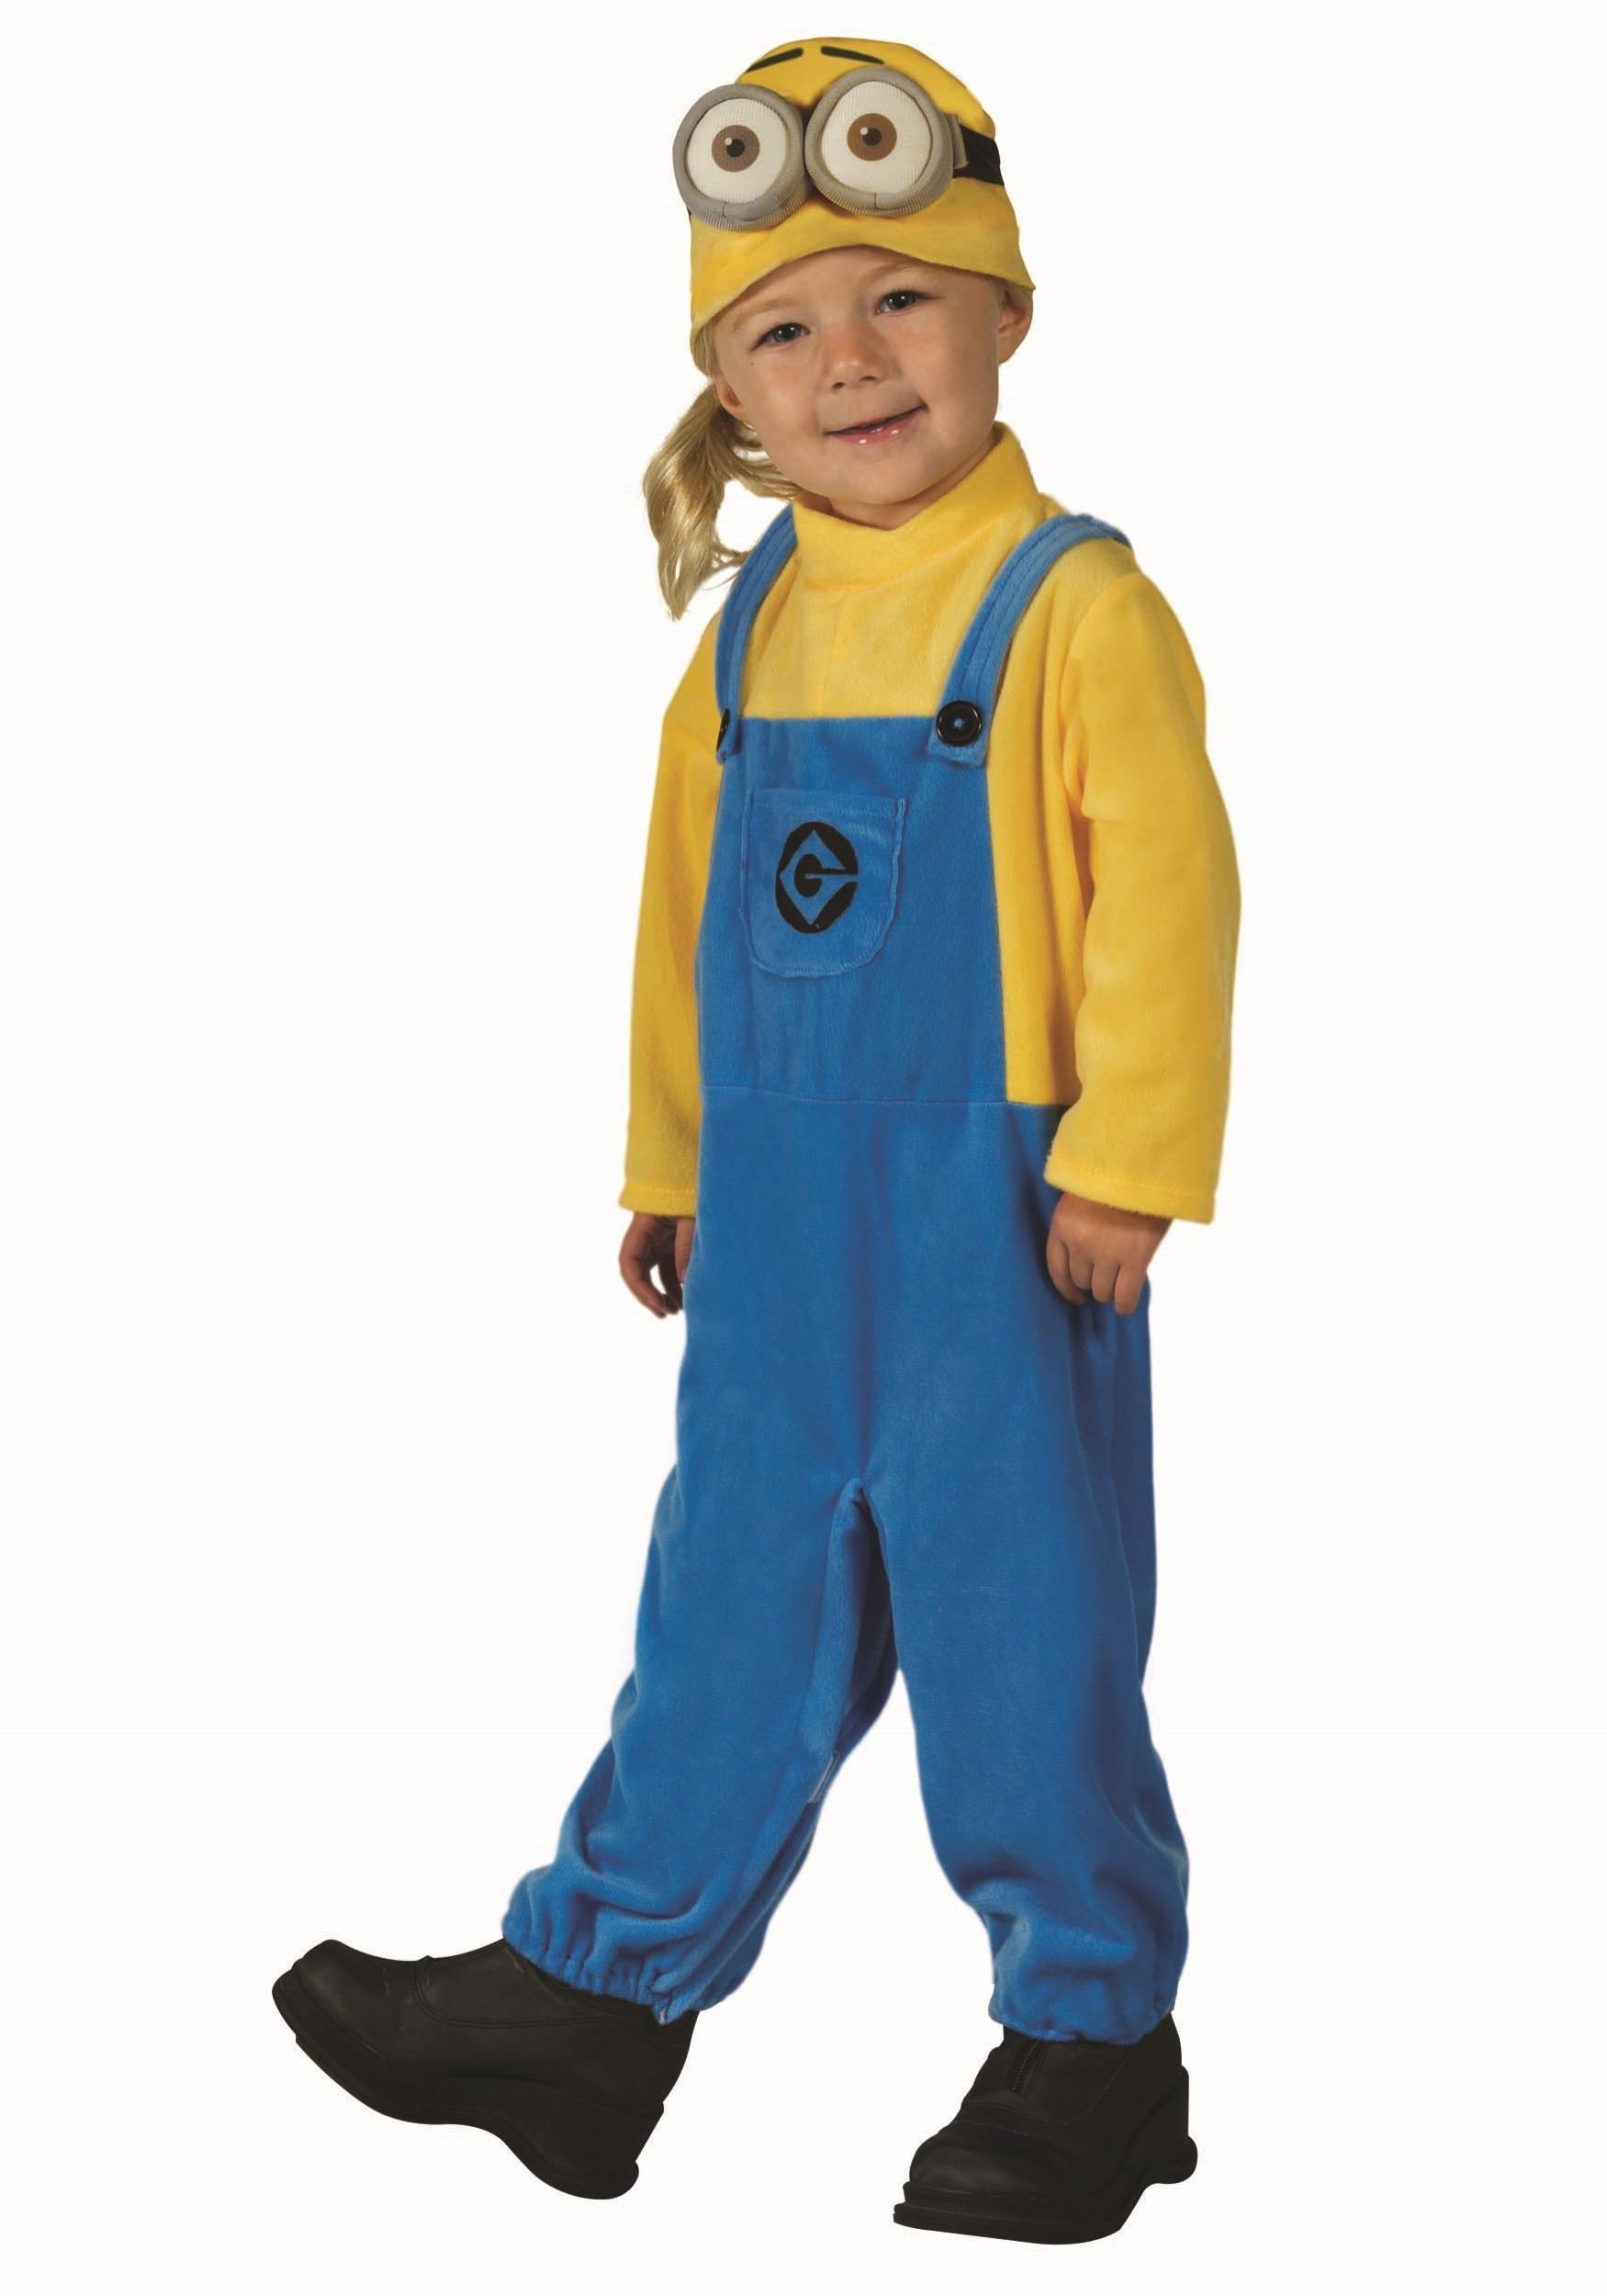 Despicable Me 3 Minion Toddler Costume